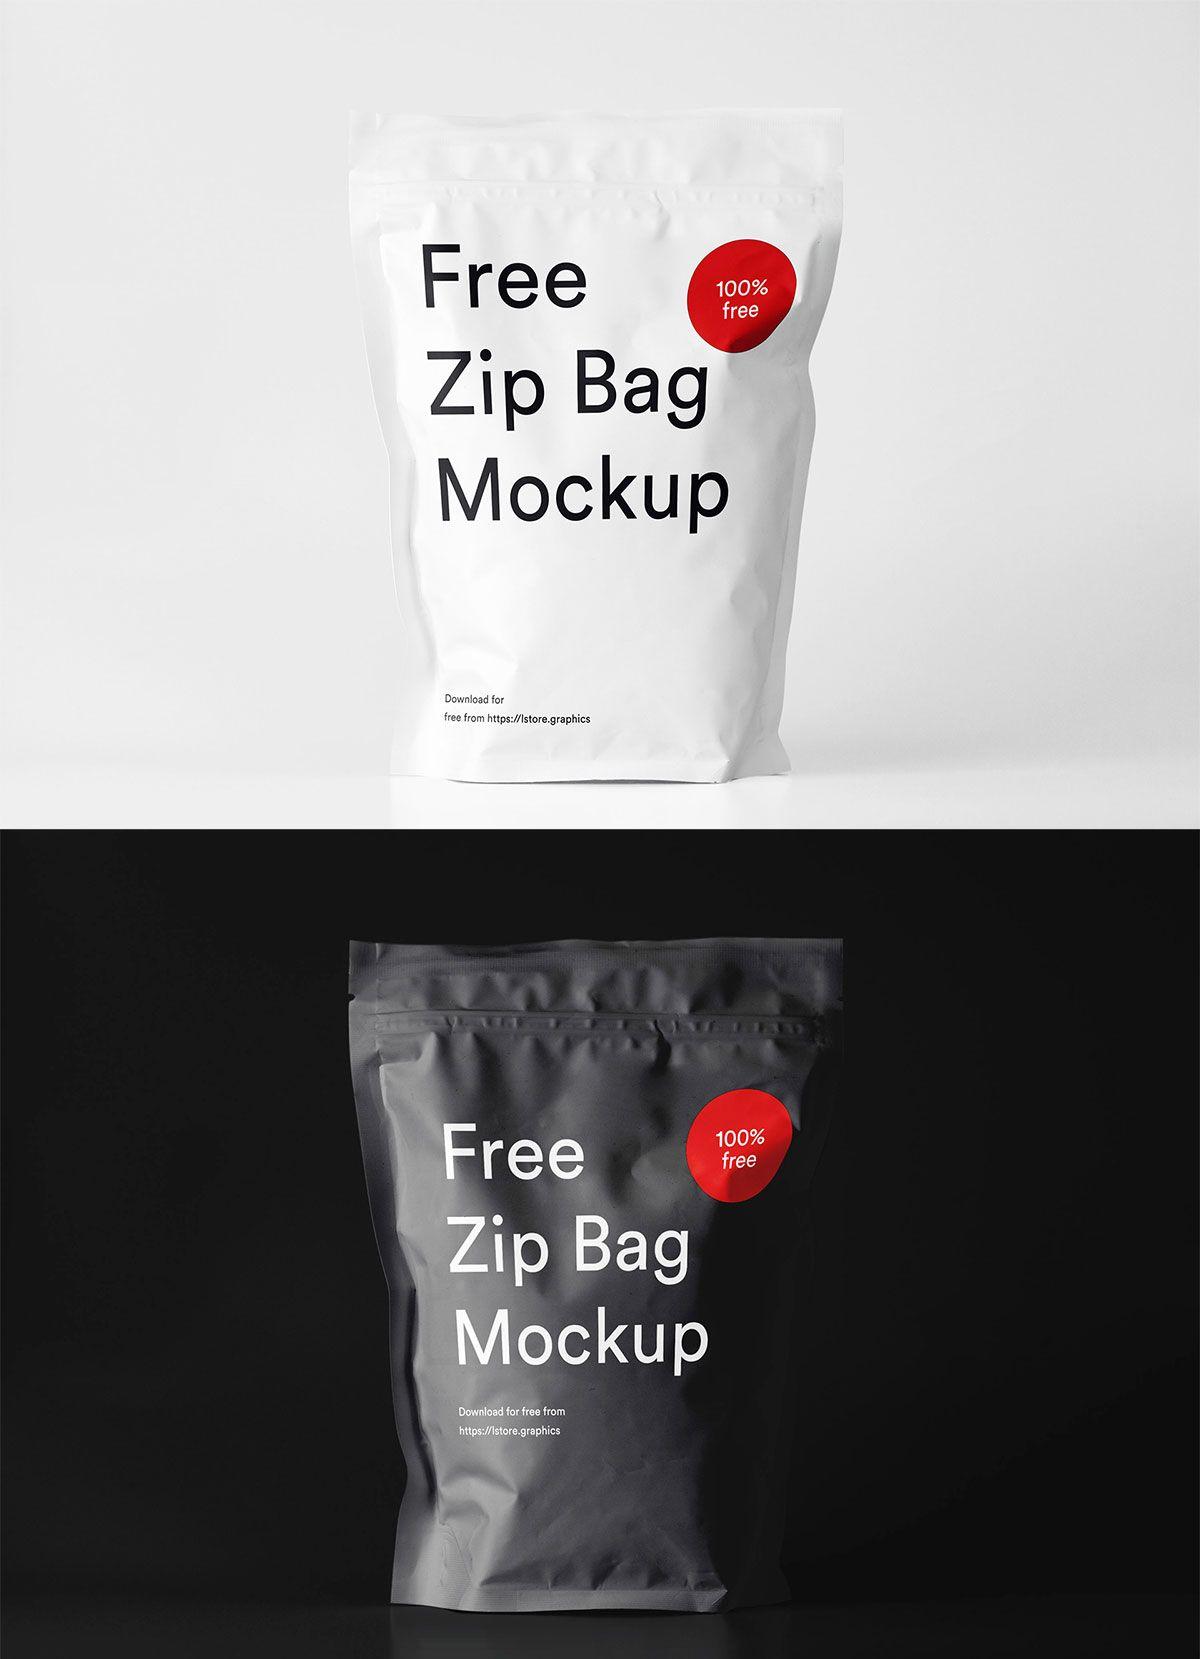 Download Free Zip Bag Mockup Bag Mockup Zipped Bag Free Mockup